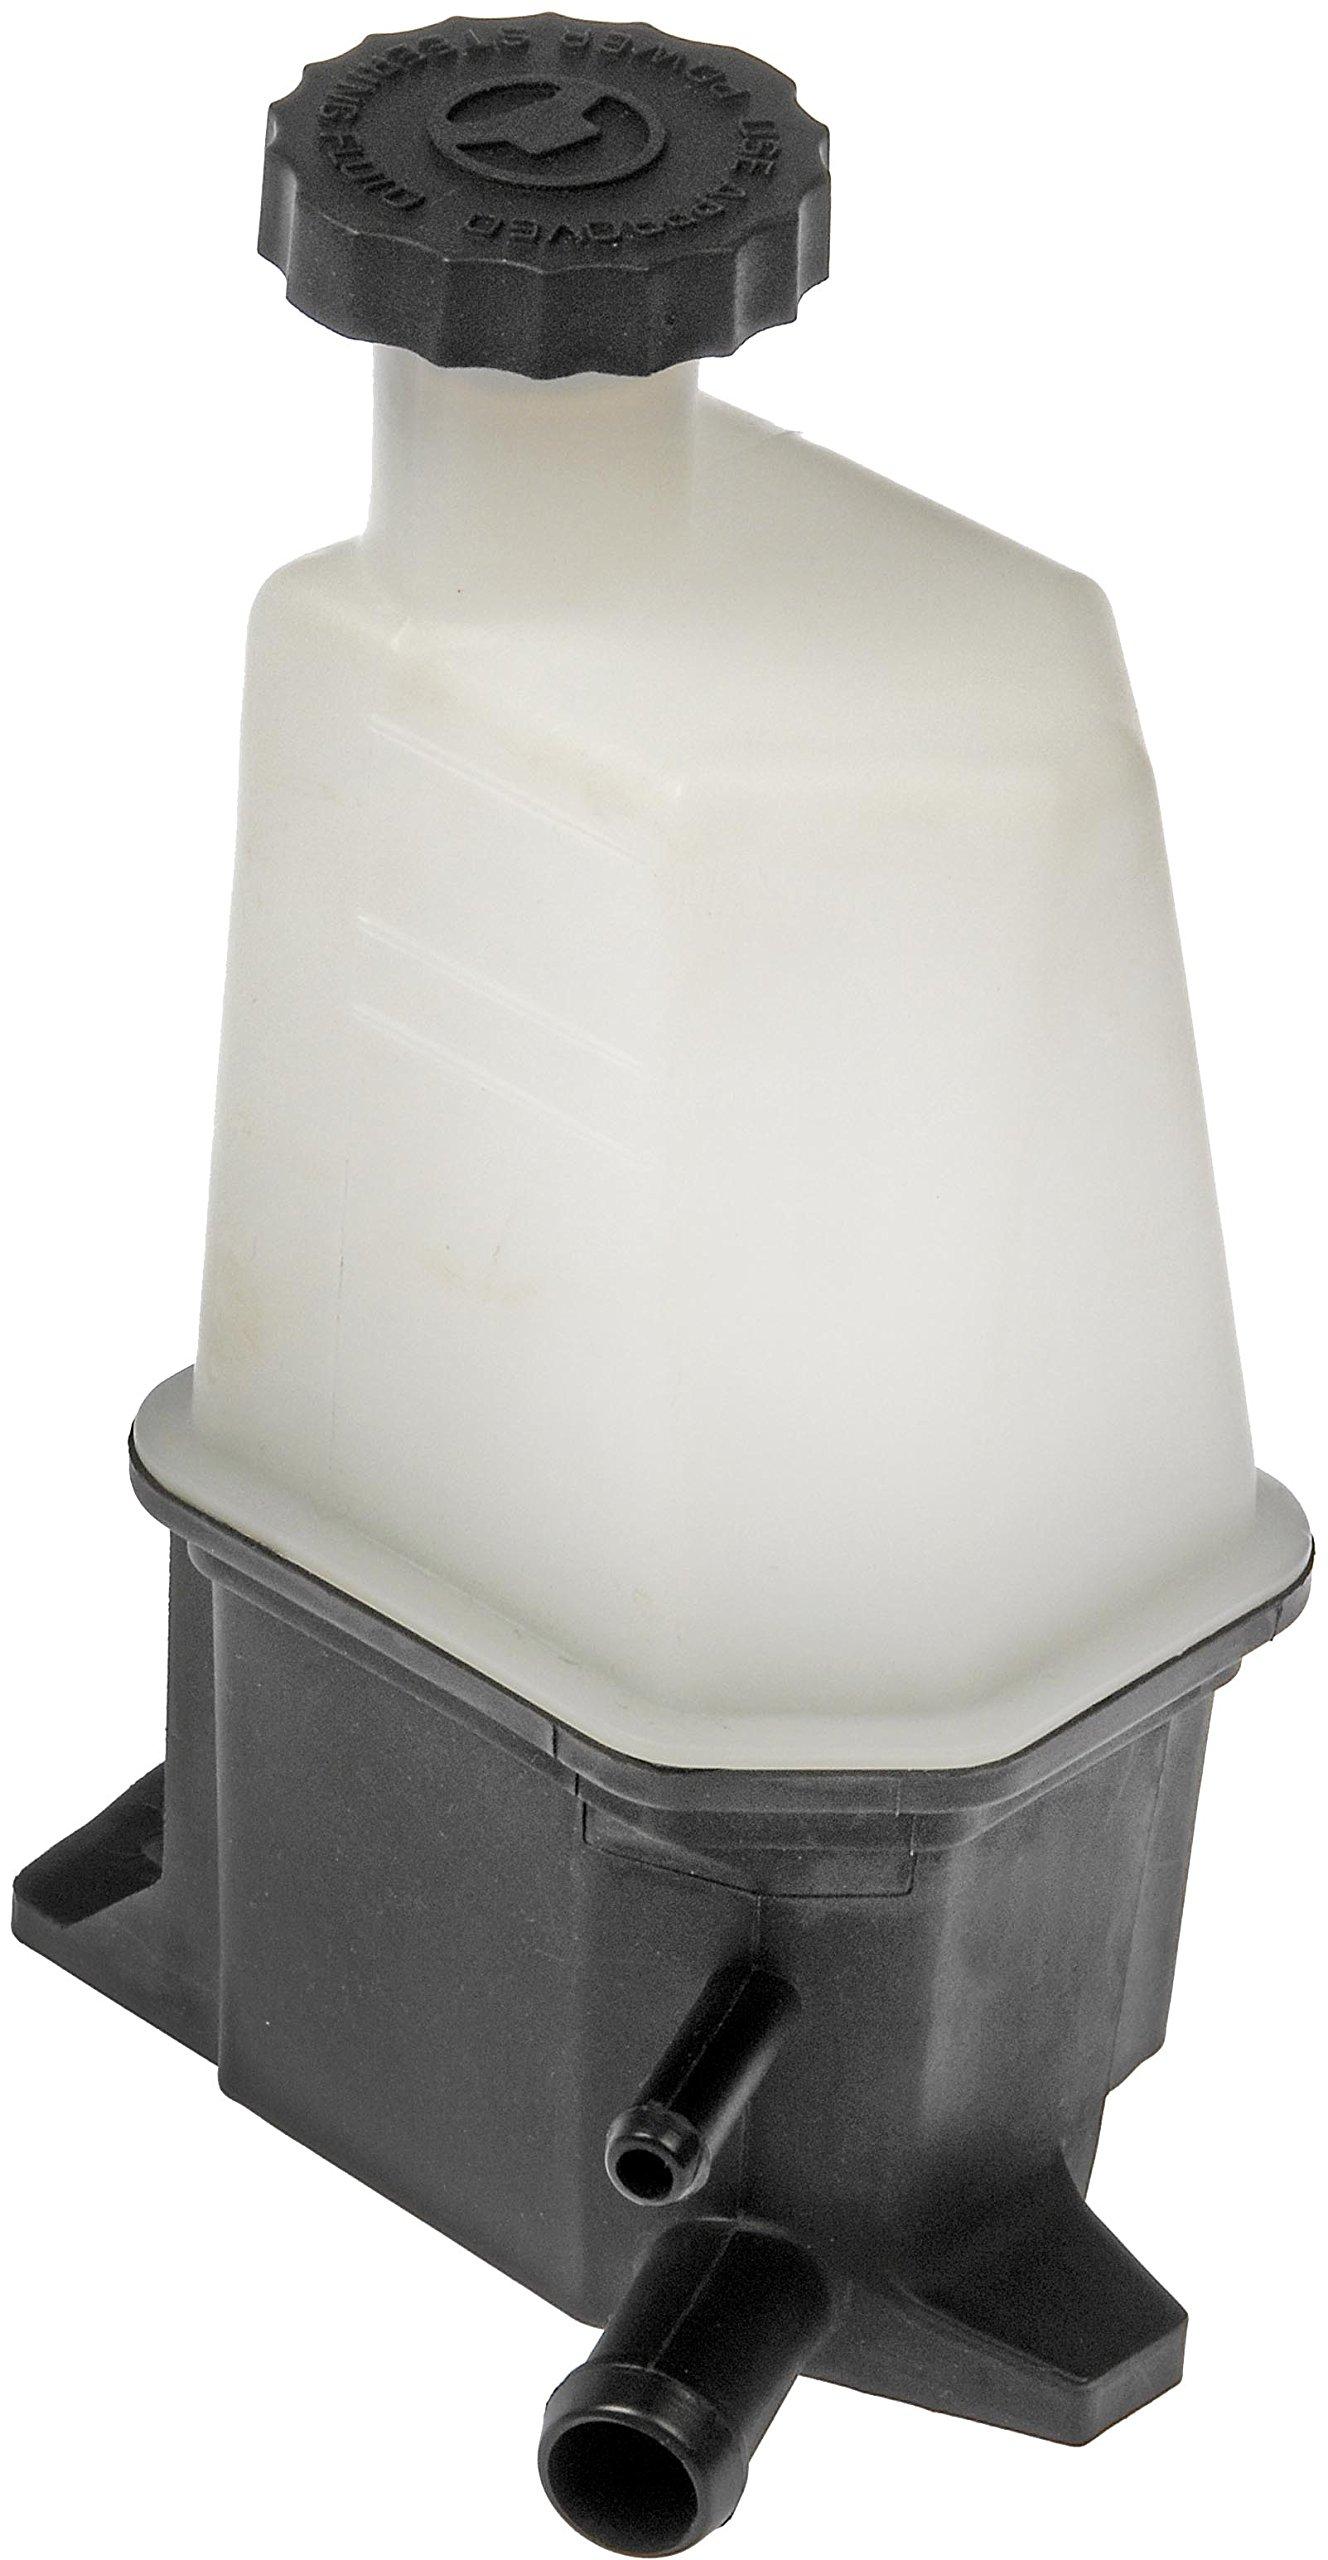 Dorman 603-933 Power Steering Reservoir product image